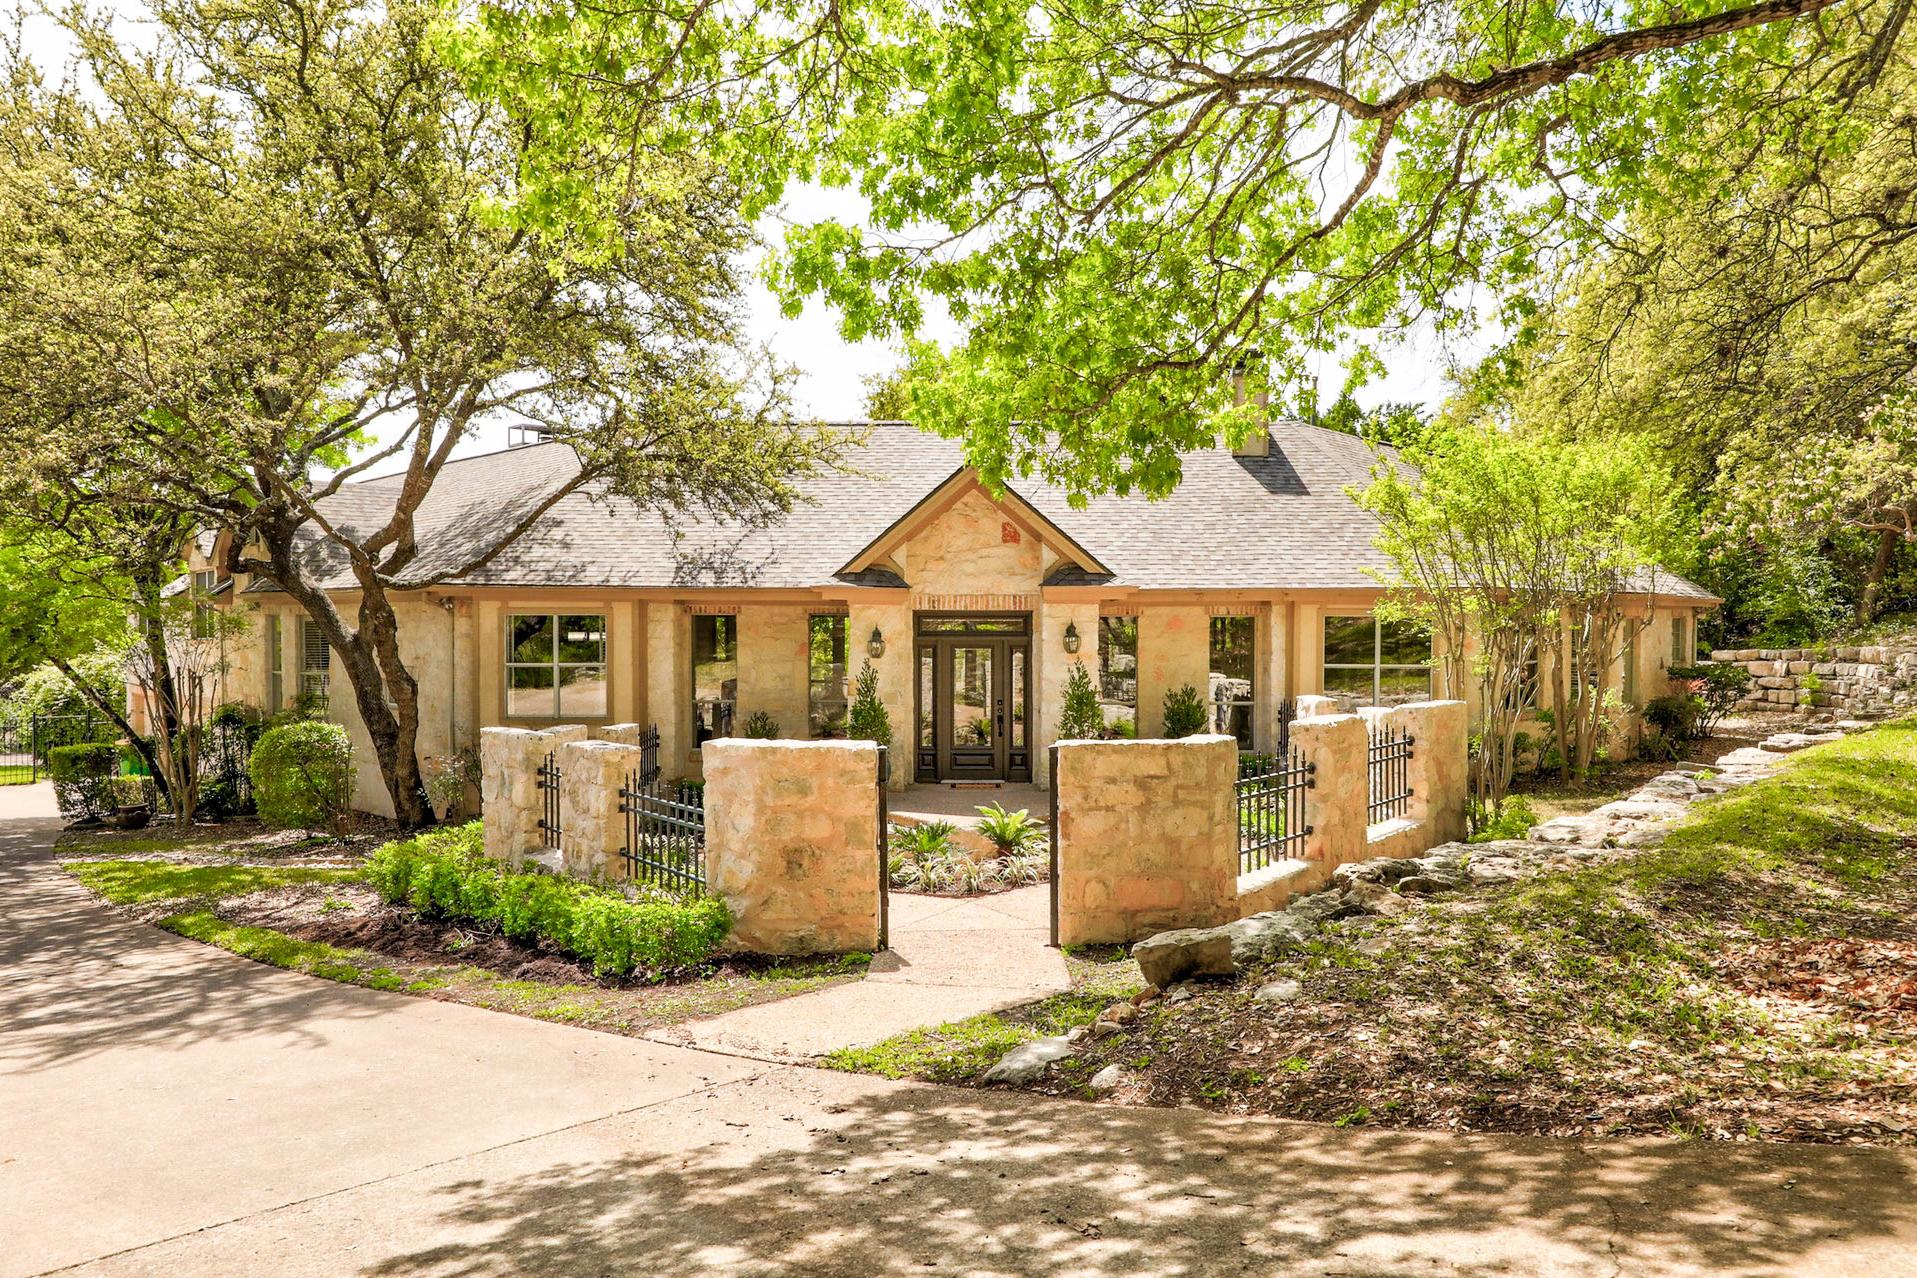 601 Furlong Drive   Sun 2-4pm   $1,395,000   Listed by Beth Drewett